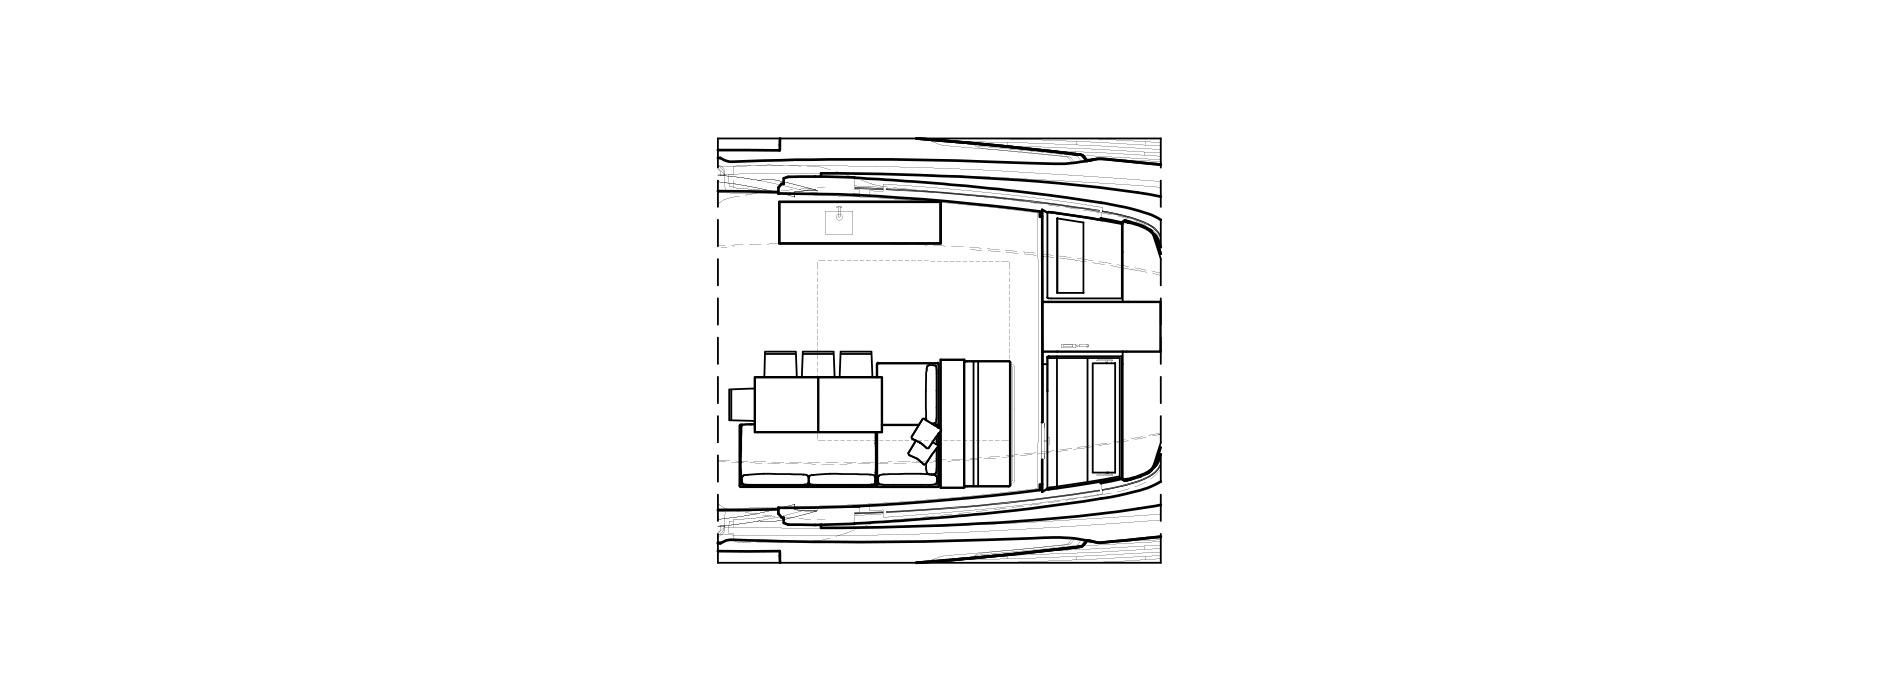 Sanlorenzo Yachts SX88 Details Version USA